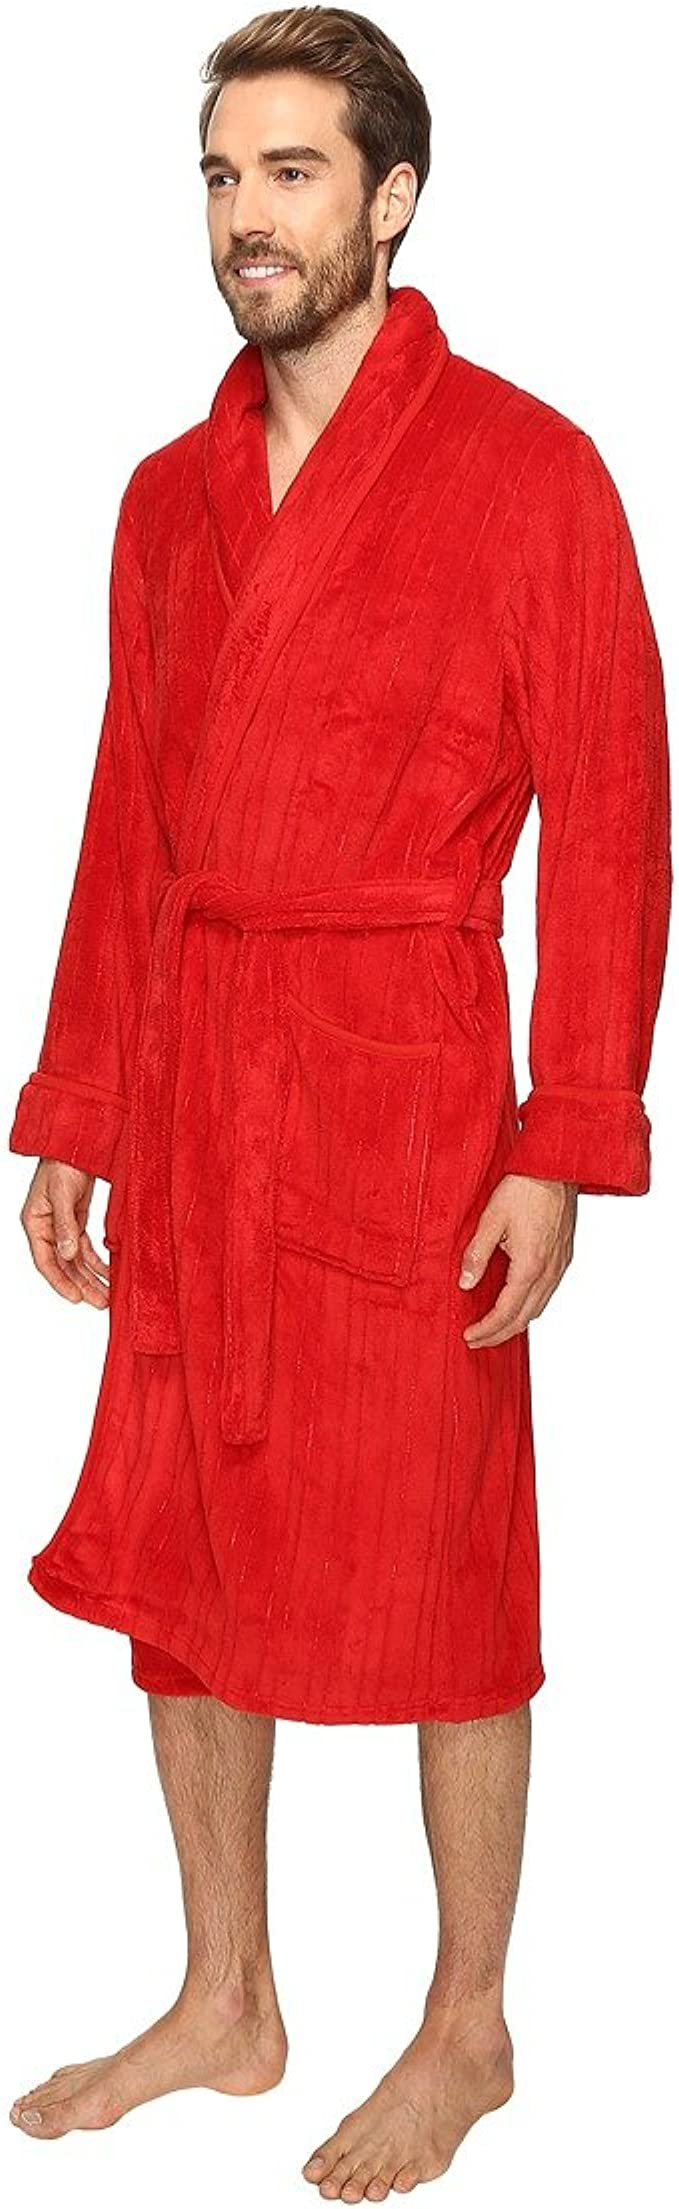 Jockey Mens Sculpted Comfort Soft Robe Red One Size Jockey Men/'s Sleepwear 2512107JY